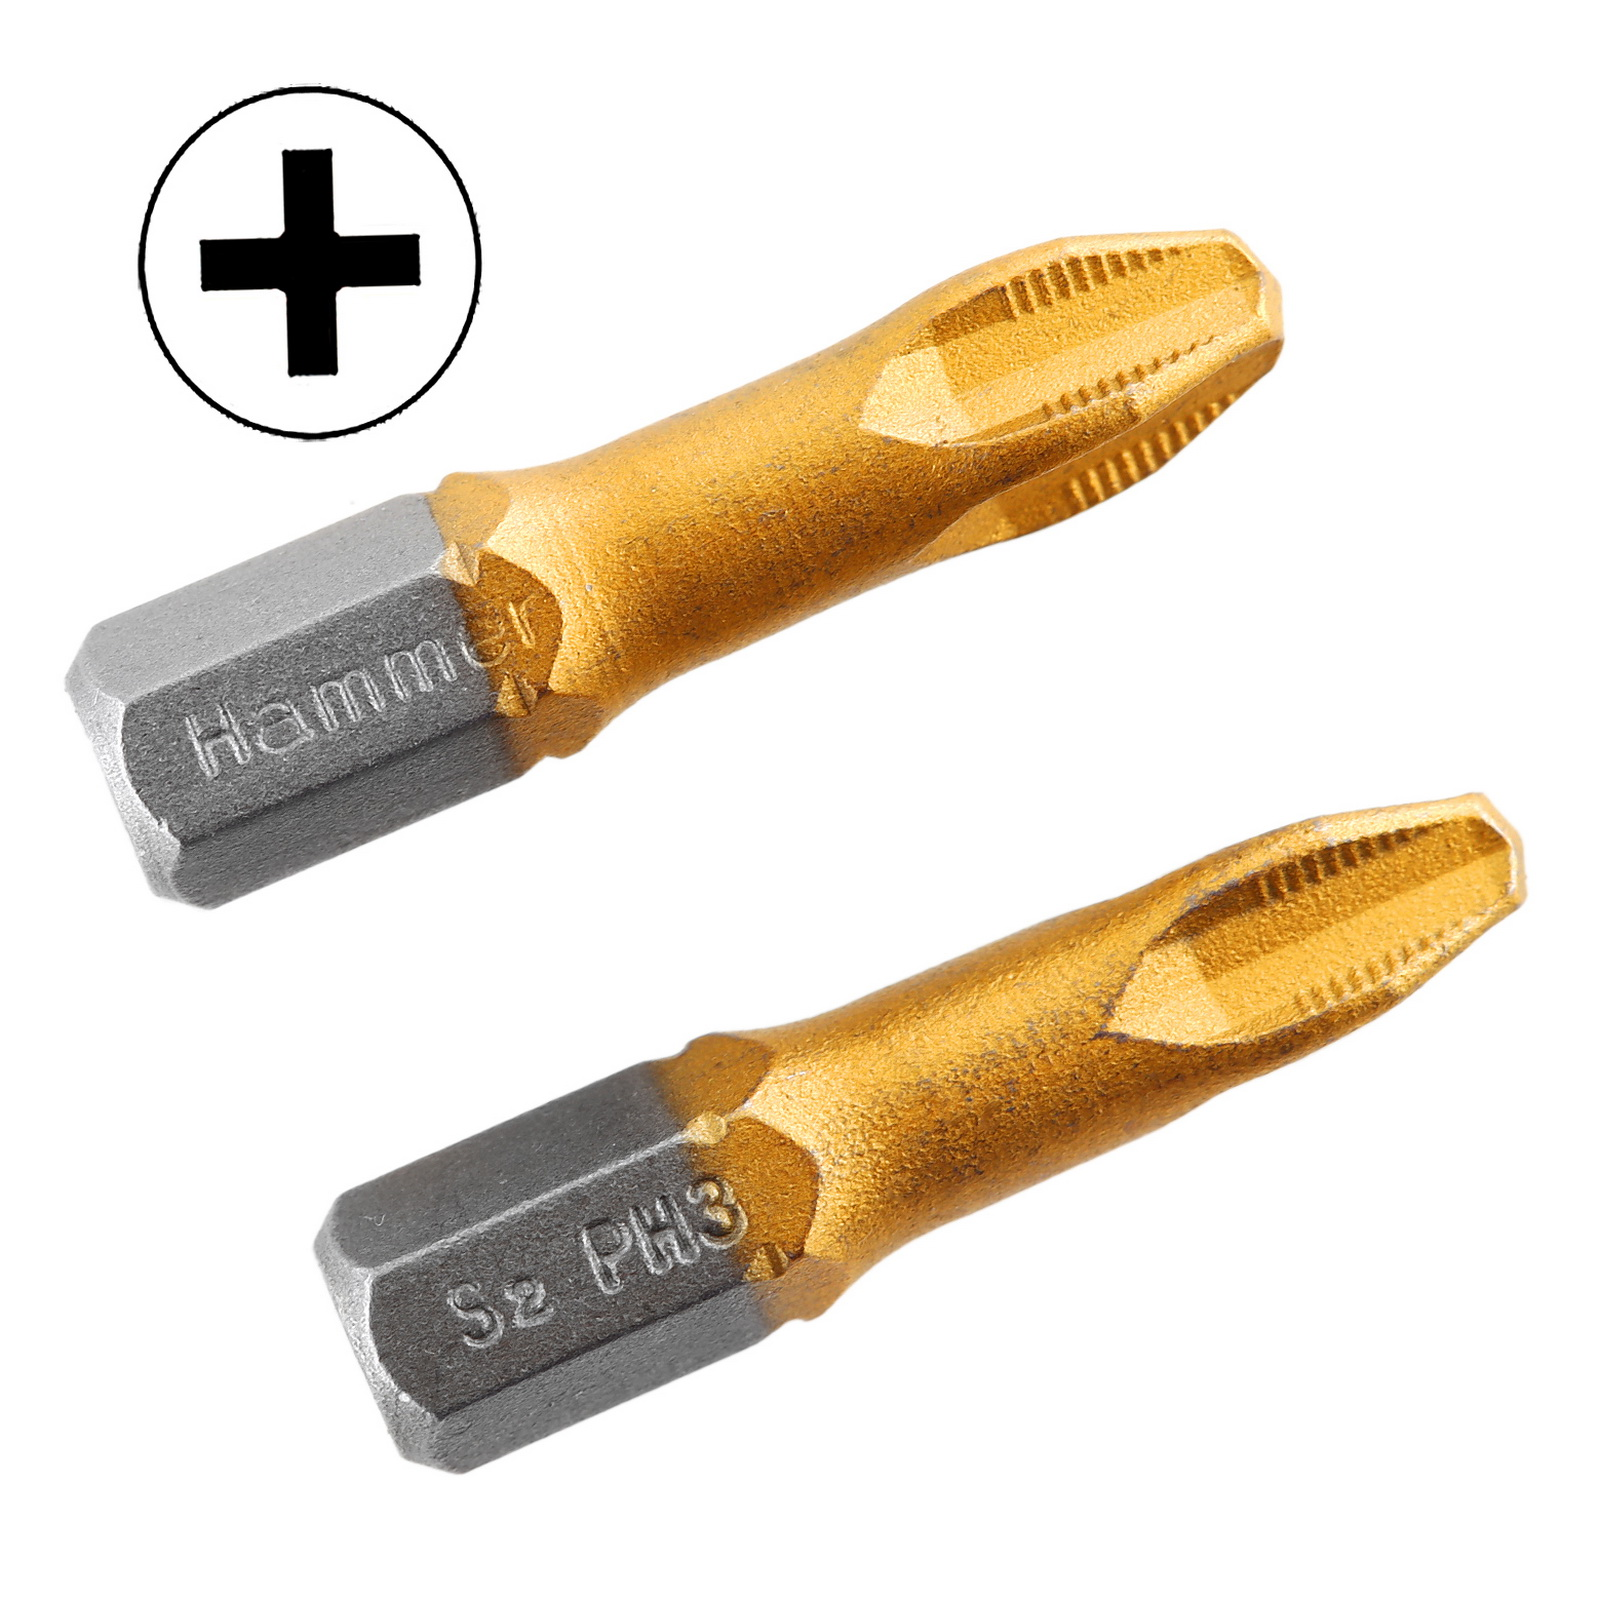 Бита Hammer Pb ph-3 25мм (2шт.) цена